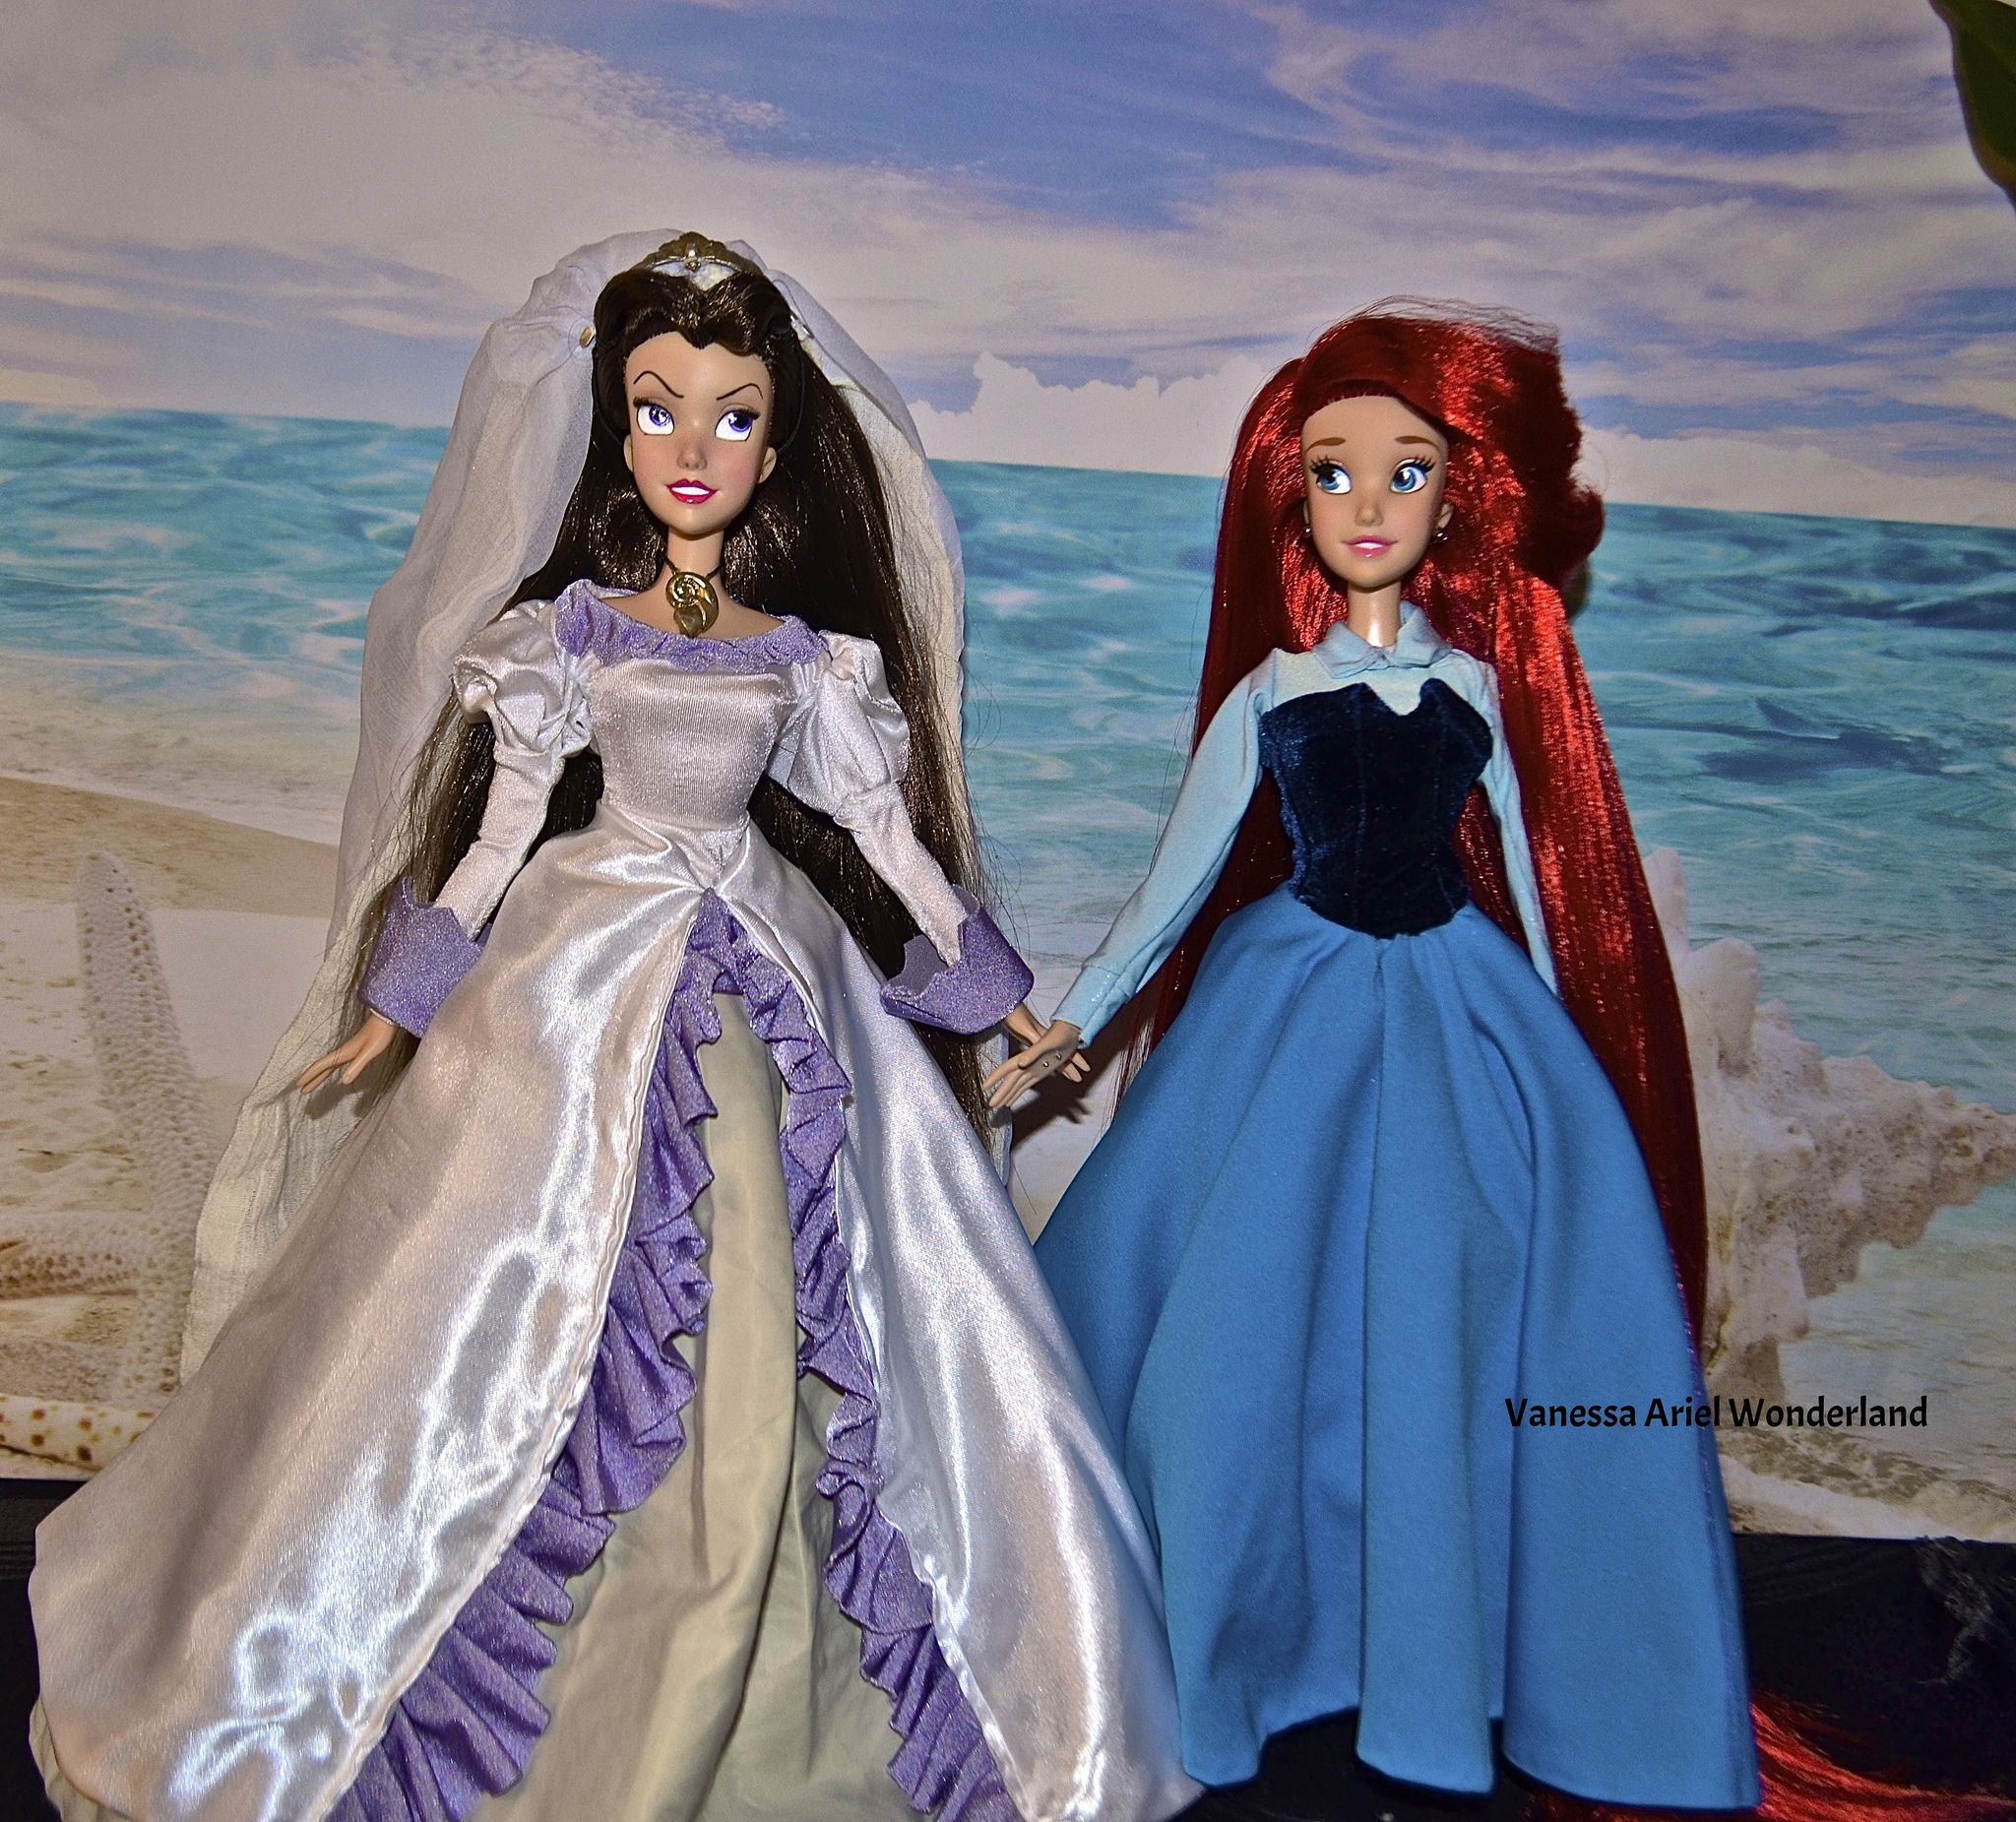 Vanessa Wedding Day Repaint 17 Inches Ariel Kingdom Dress 17 Inches Full Reroot Hair By Vanessa Ariel The Little Mermaid Wedding Dresses Near Me Clearance Wedding Dresses Ariel The Little Mermaid [ 1851 x 2048 Pixel ]